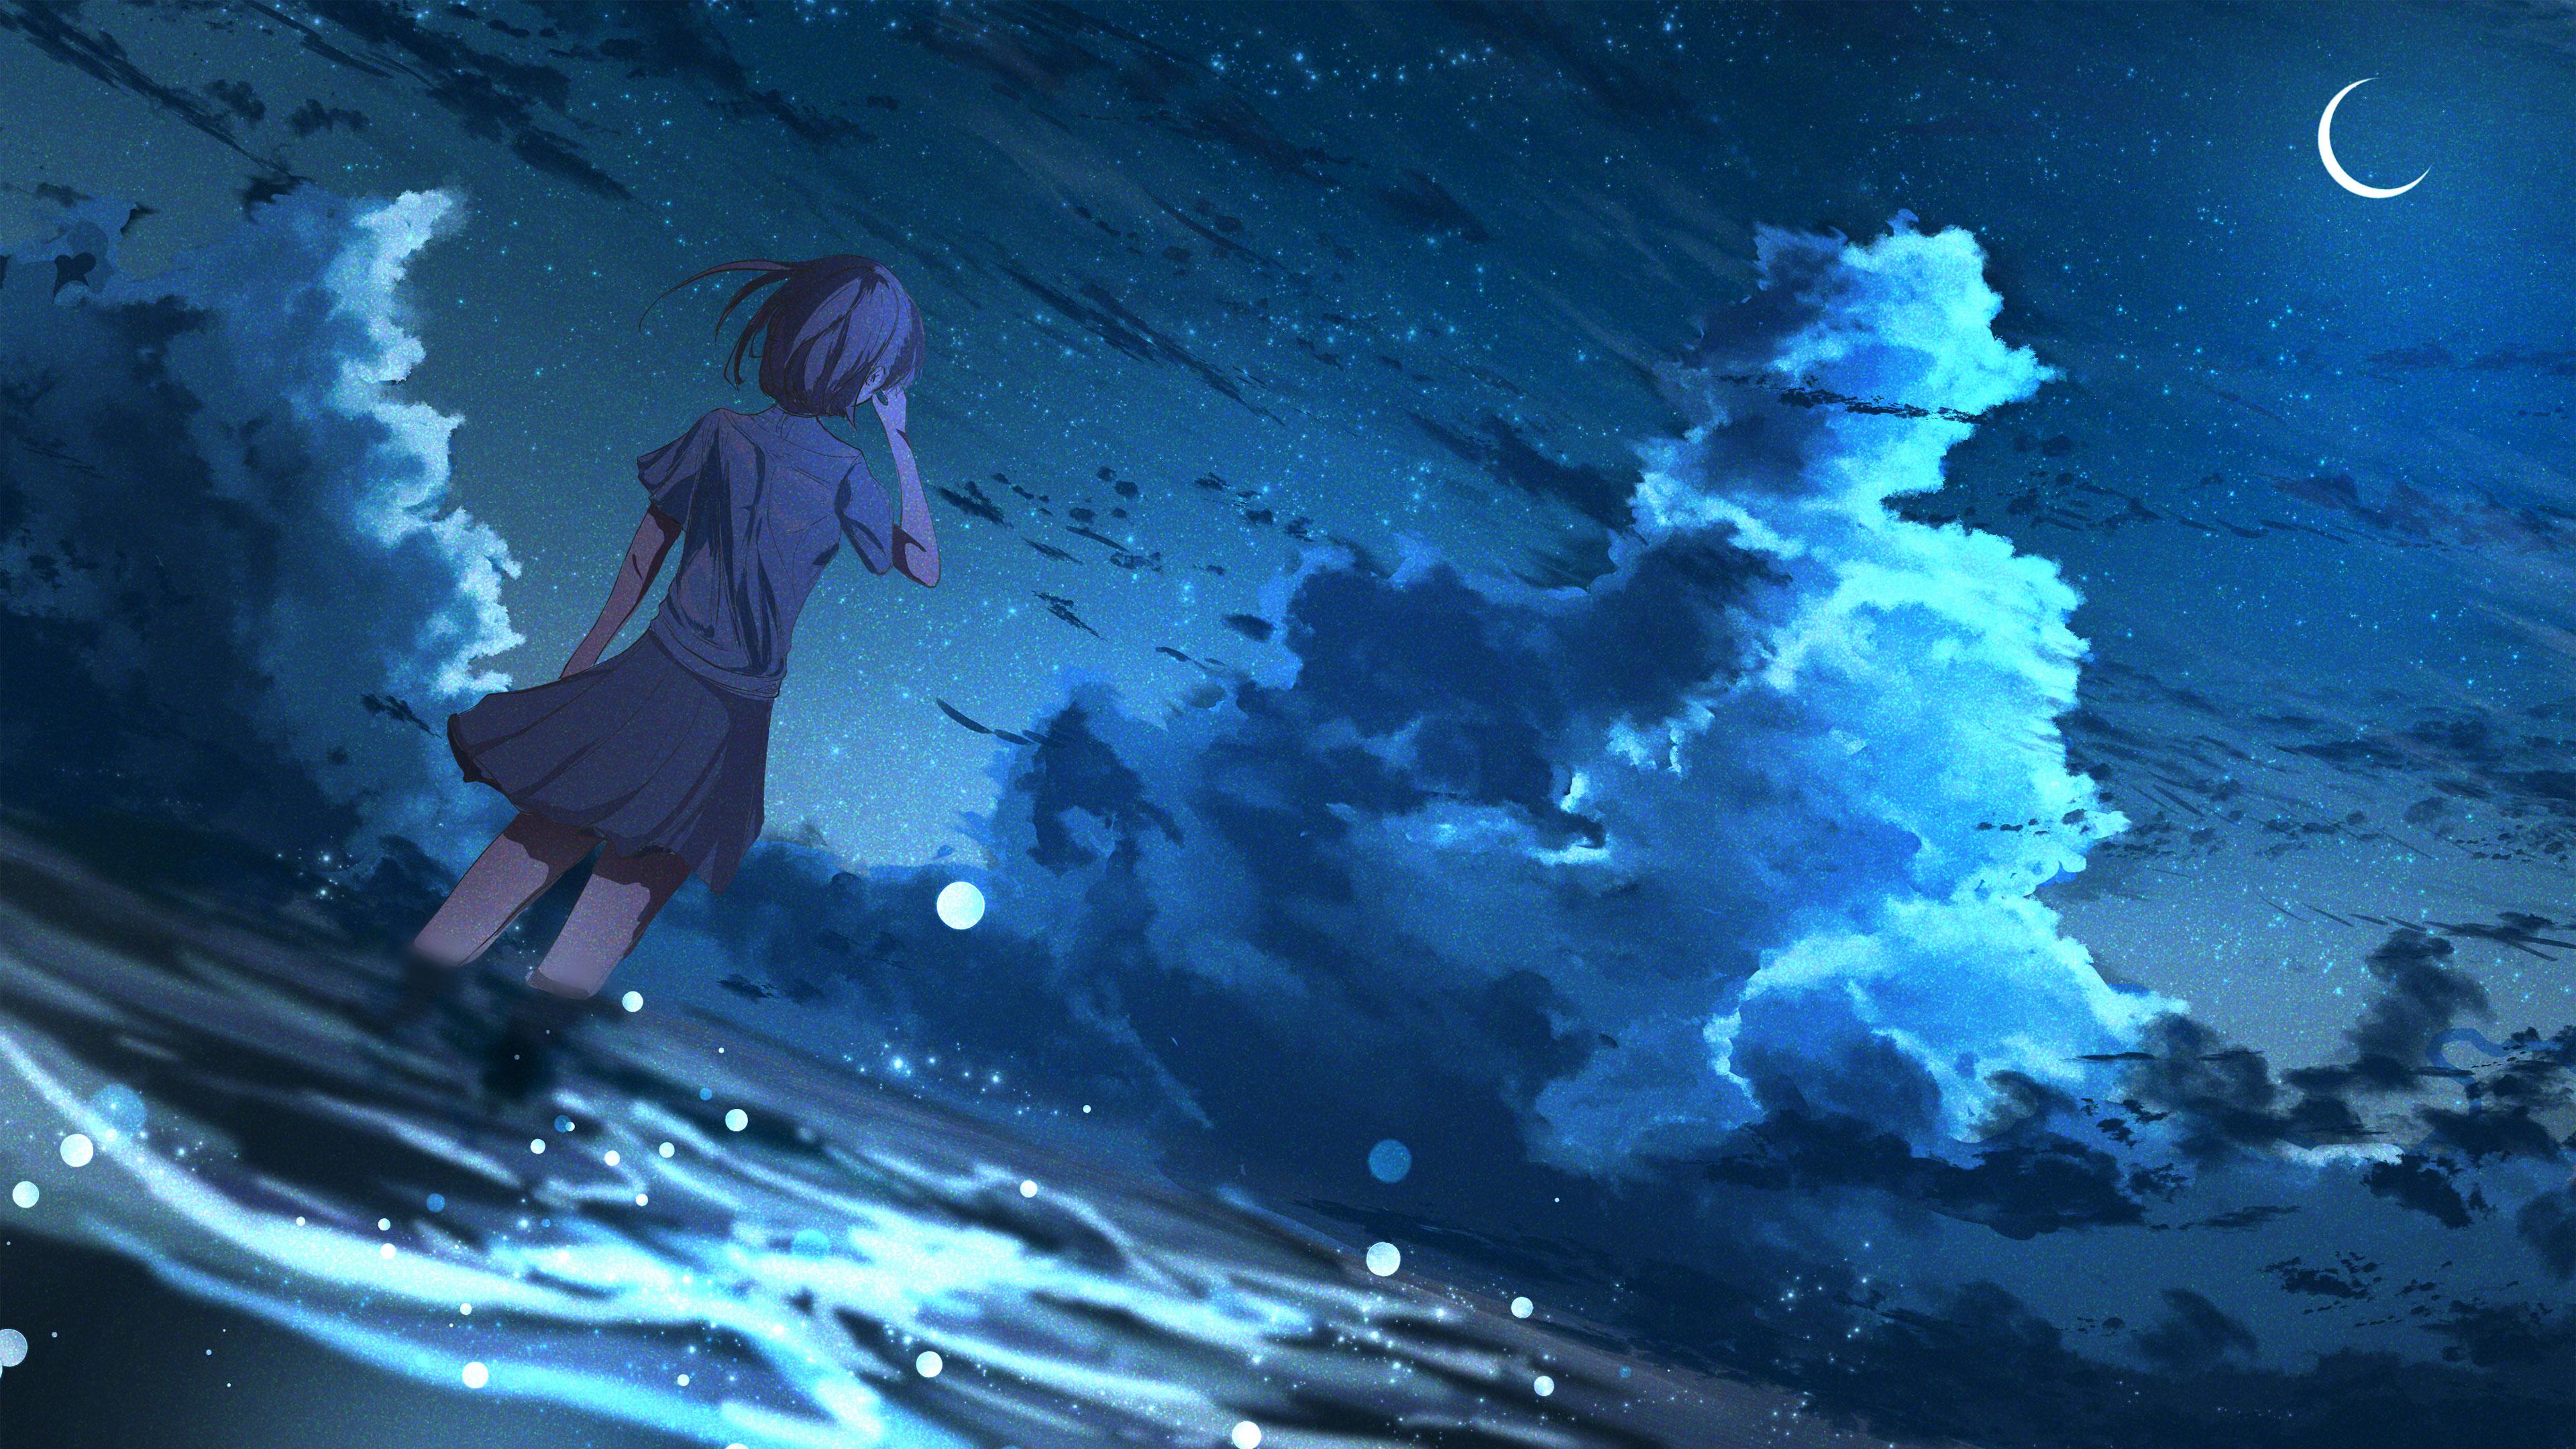 9x9 Anime Girl in Half Moon Night 9K 9K Wallpaper, HD Anime